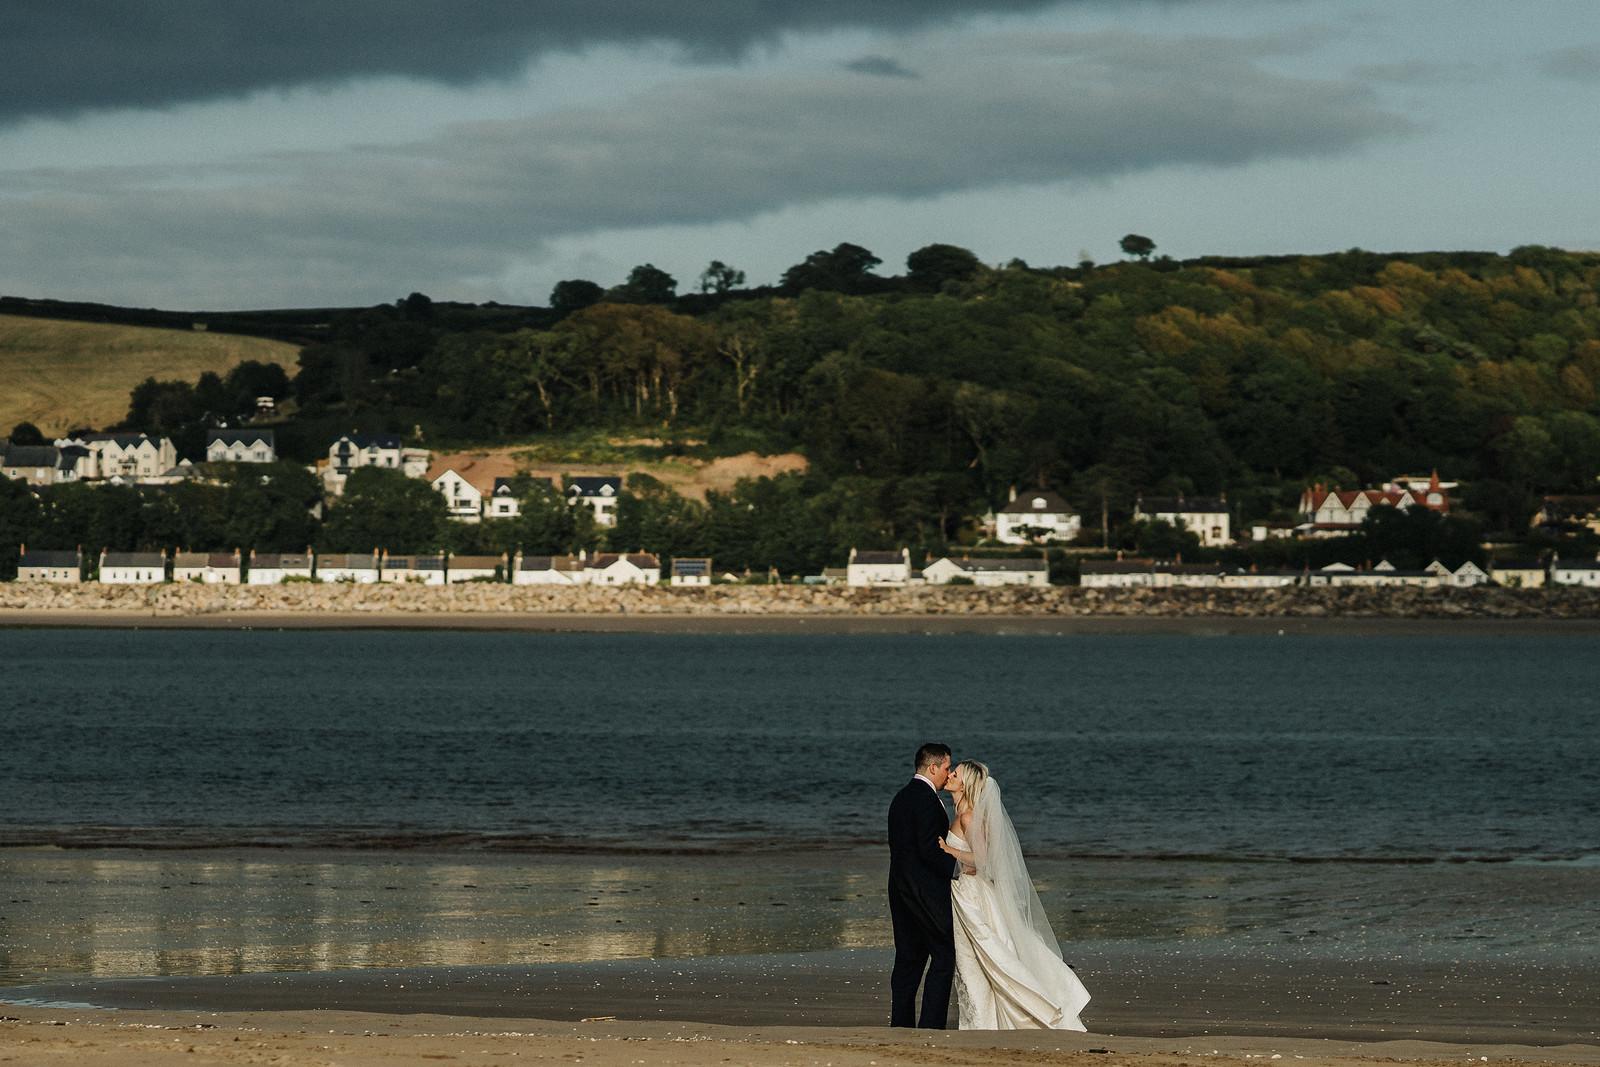 Stunning beach background, bride and groom kiss wedding photo